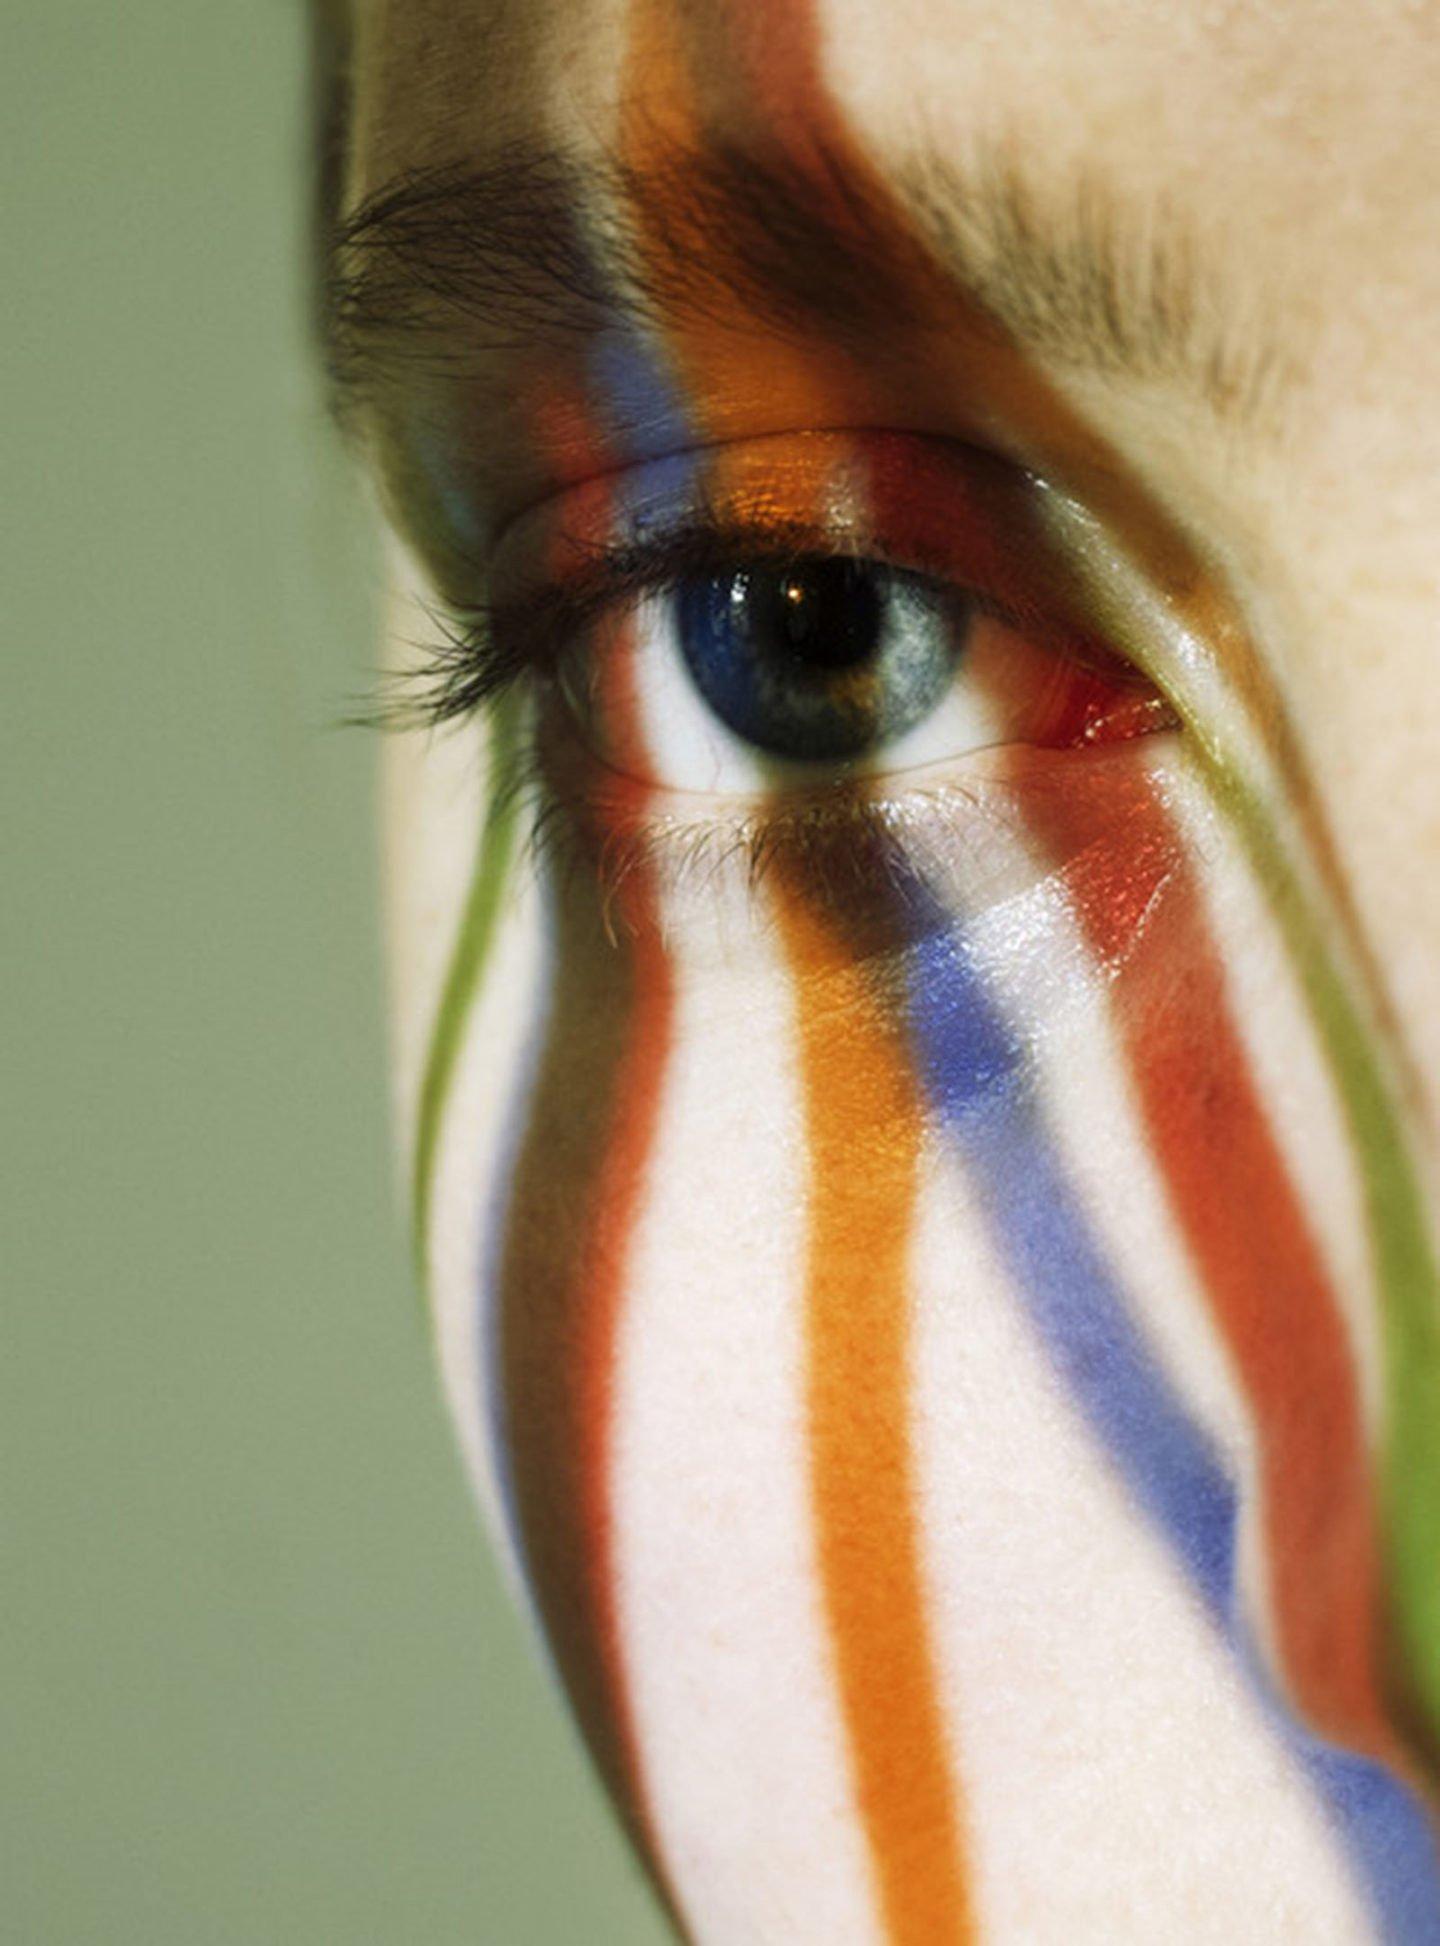 ignant-photography-jack-davison-recent-007-1440x1946